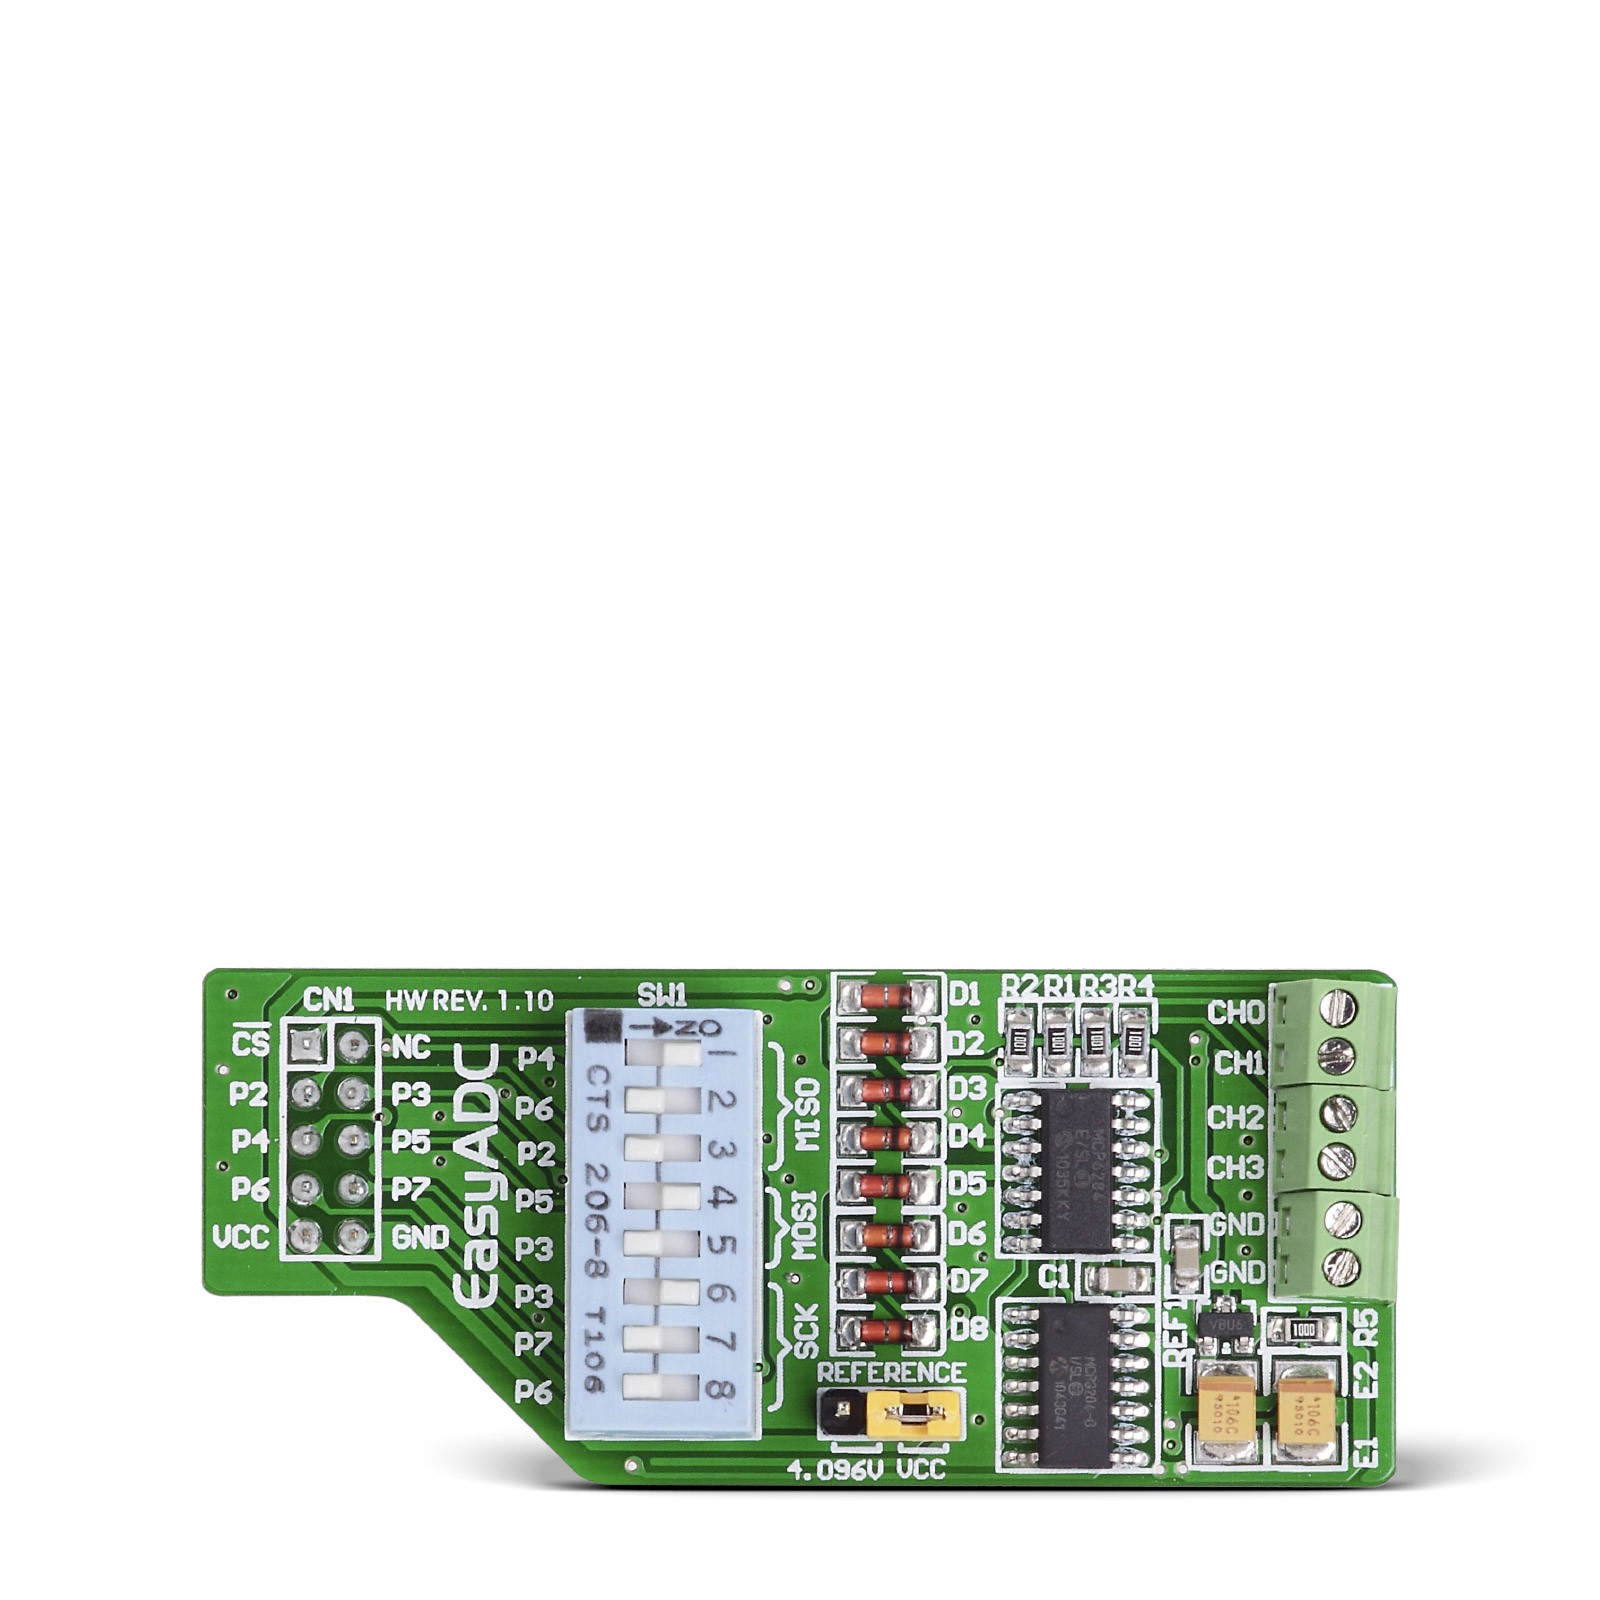 Easyadc Board With Mcp3204 4 Ch 12 Bit Analog To Digital Converter Using Pic16f877a Microcontroller Mgctlbxnmzp Mgctlbxv5112 Mgctlbxlc Mgctlbxpprestashop